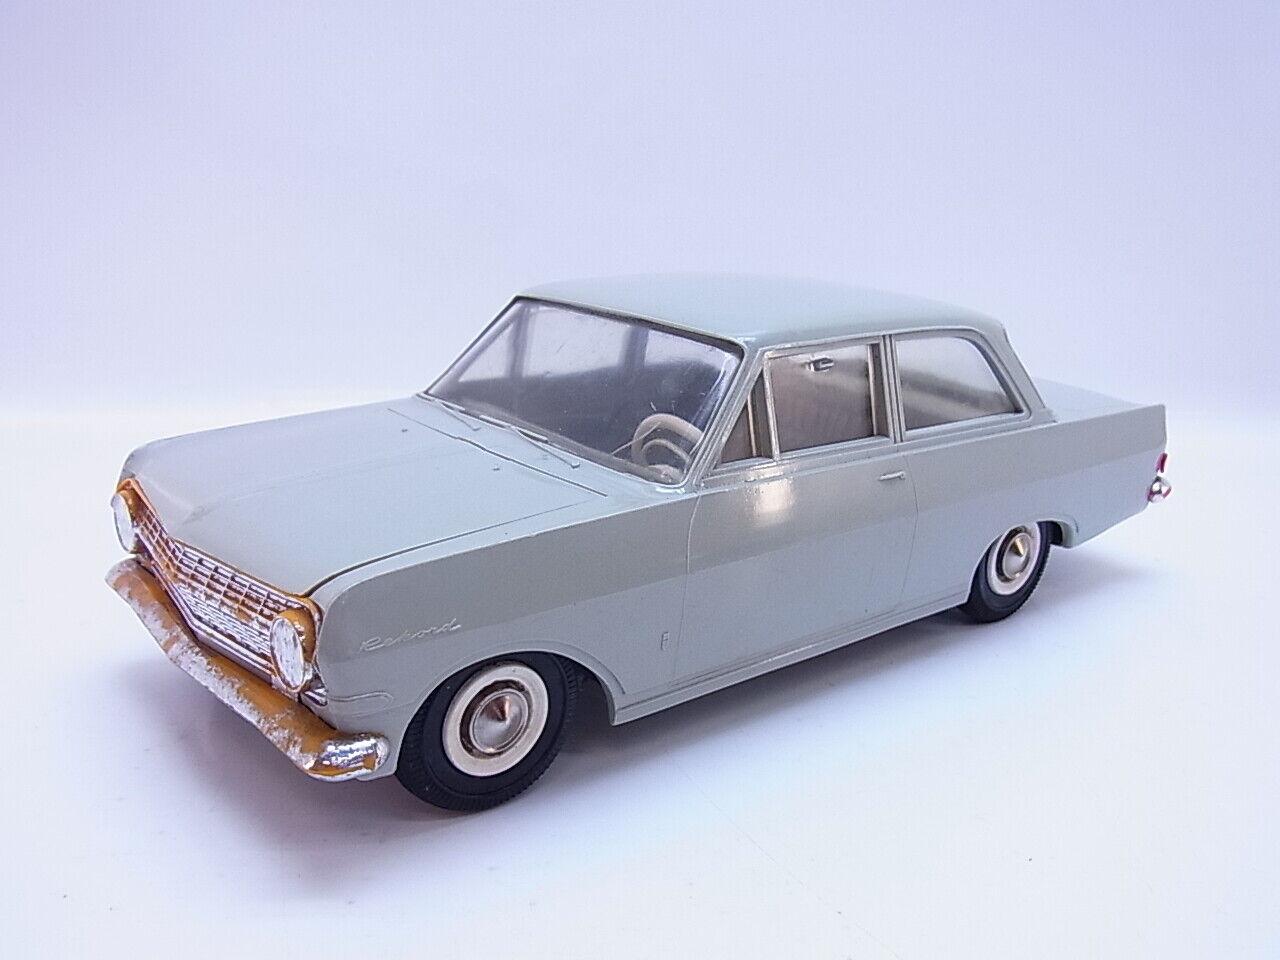 59331 Gama 462 Opel Rekord 1963 Limousine Grey 1 21 Model Car Tin Toy